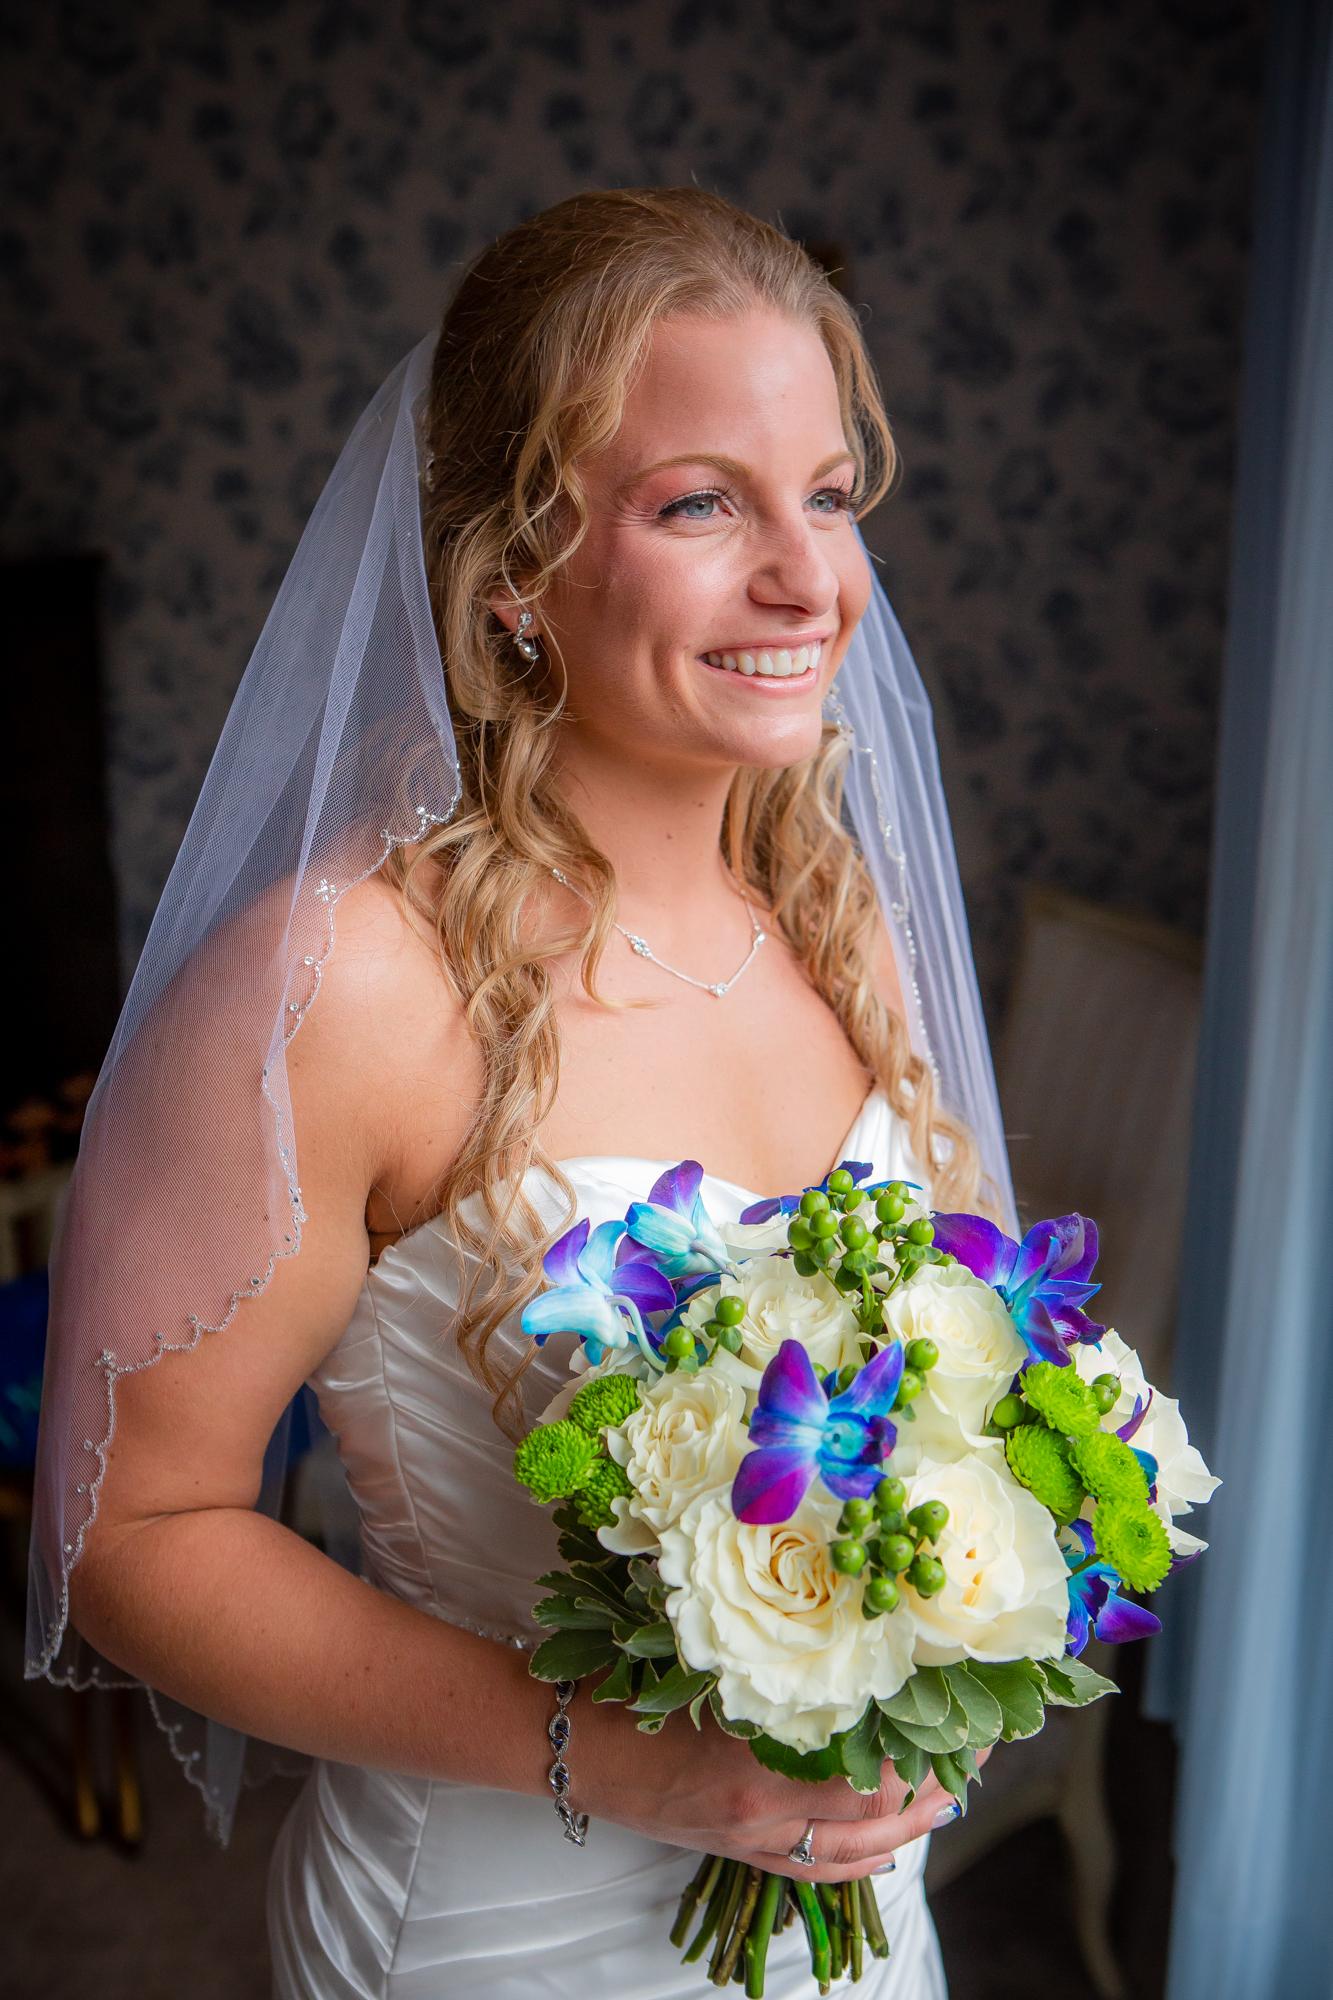 Raddison-Hotel-Corning-NY-Wedding-3677.jpg